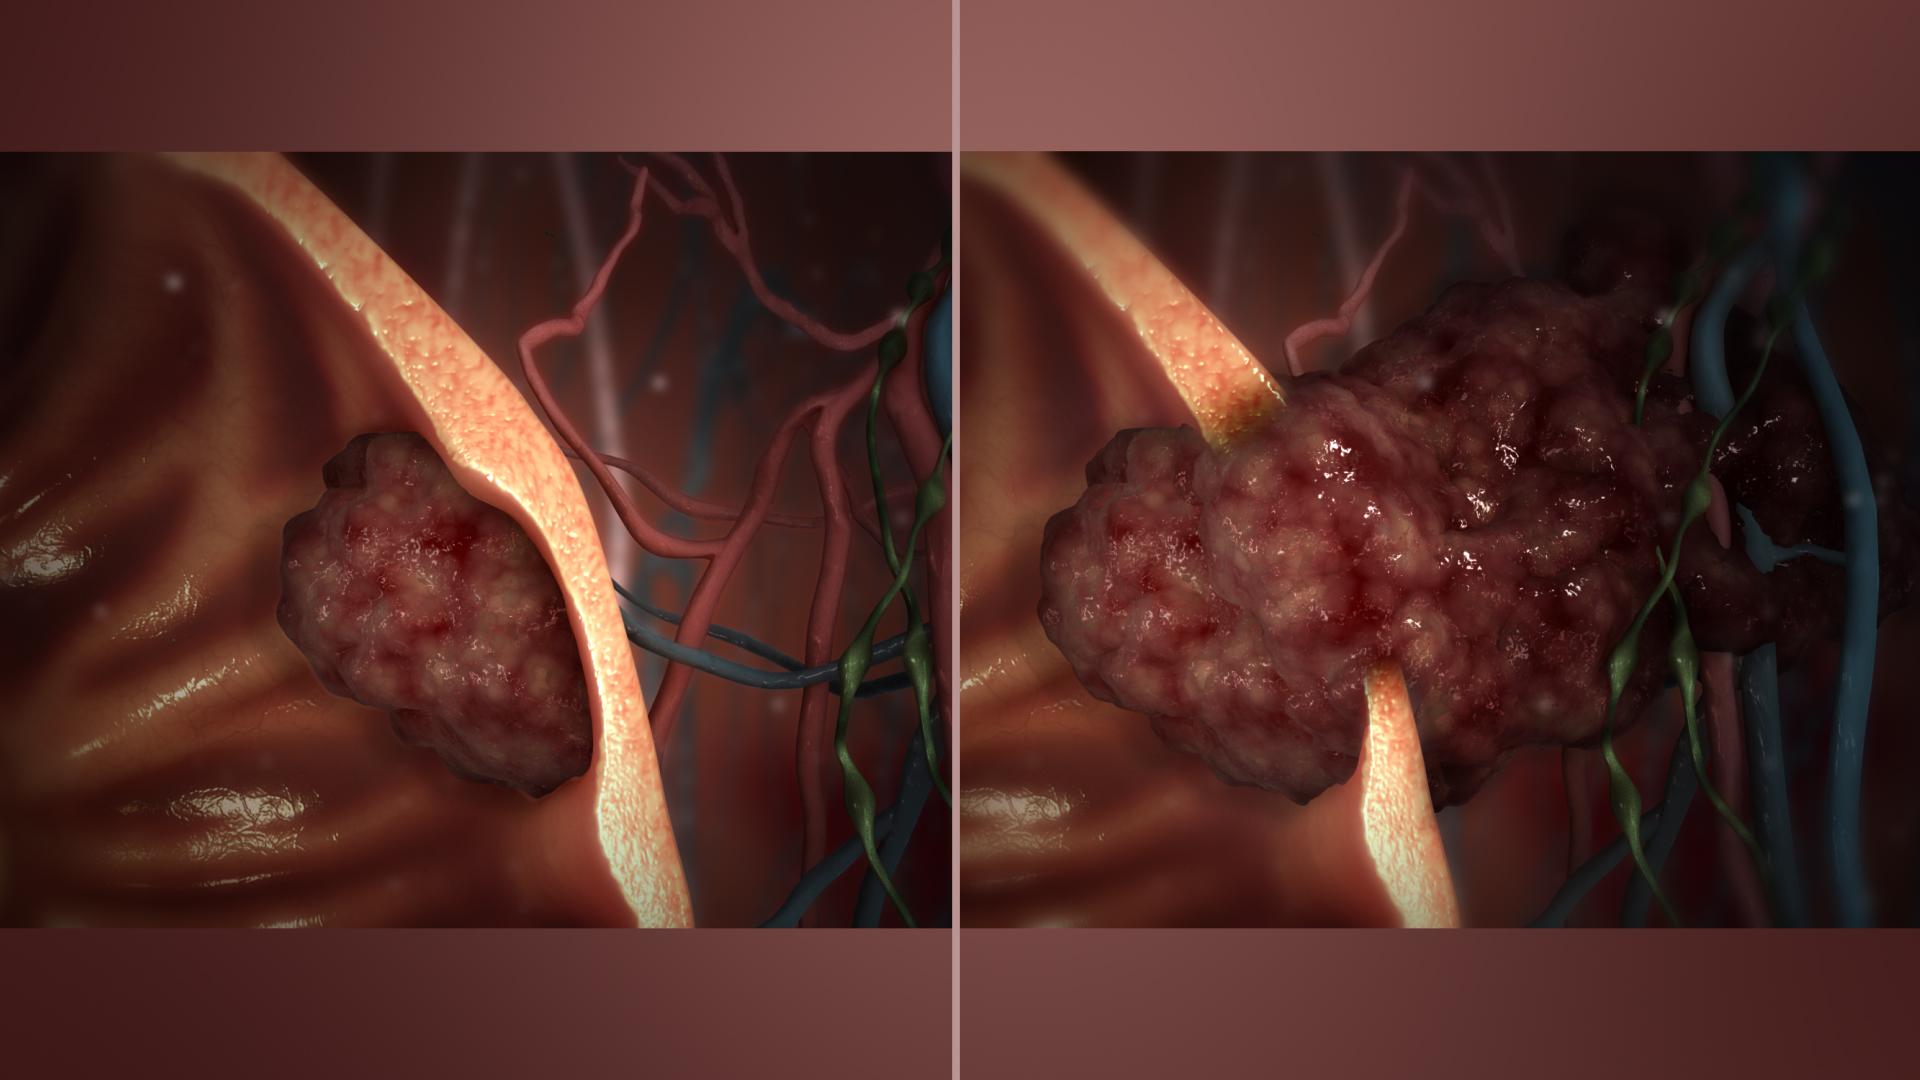 cancerul malign sau benign